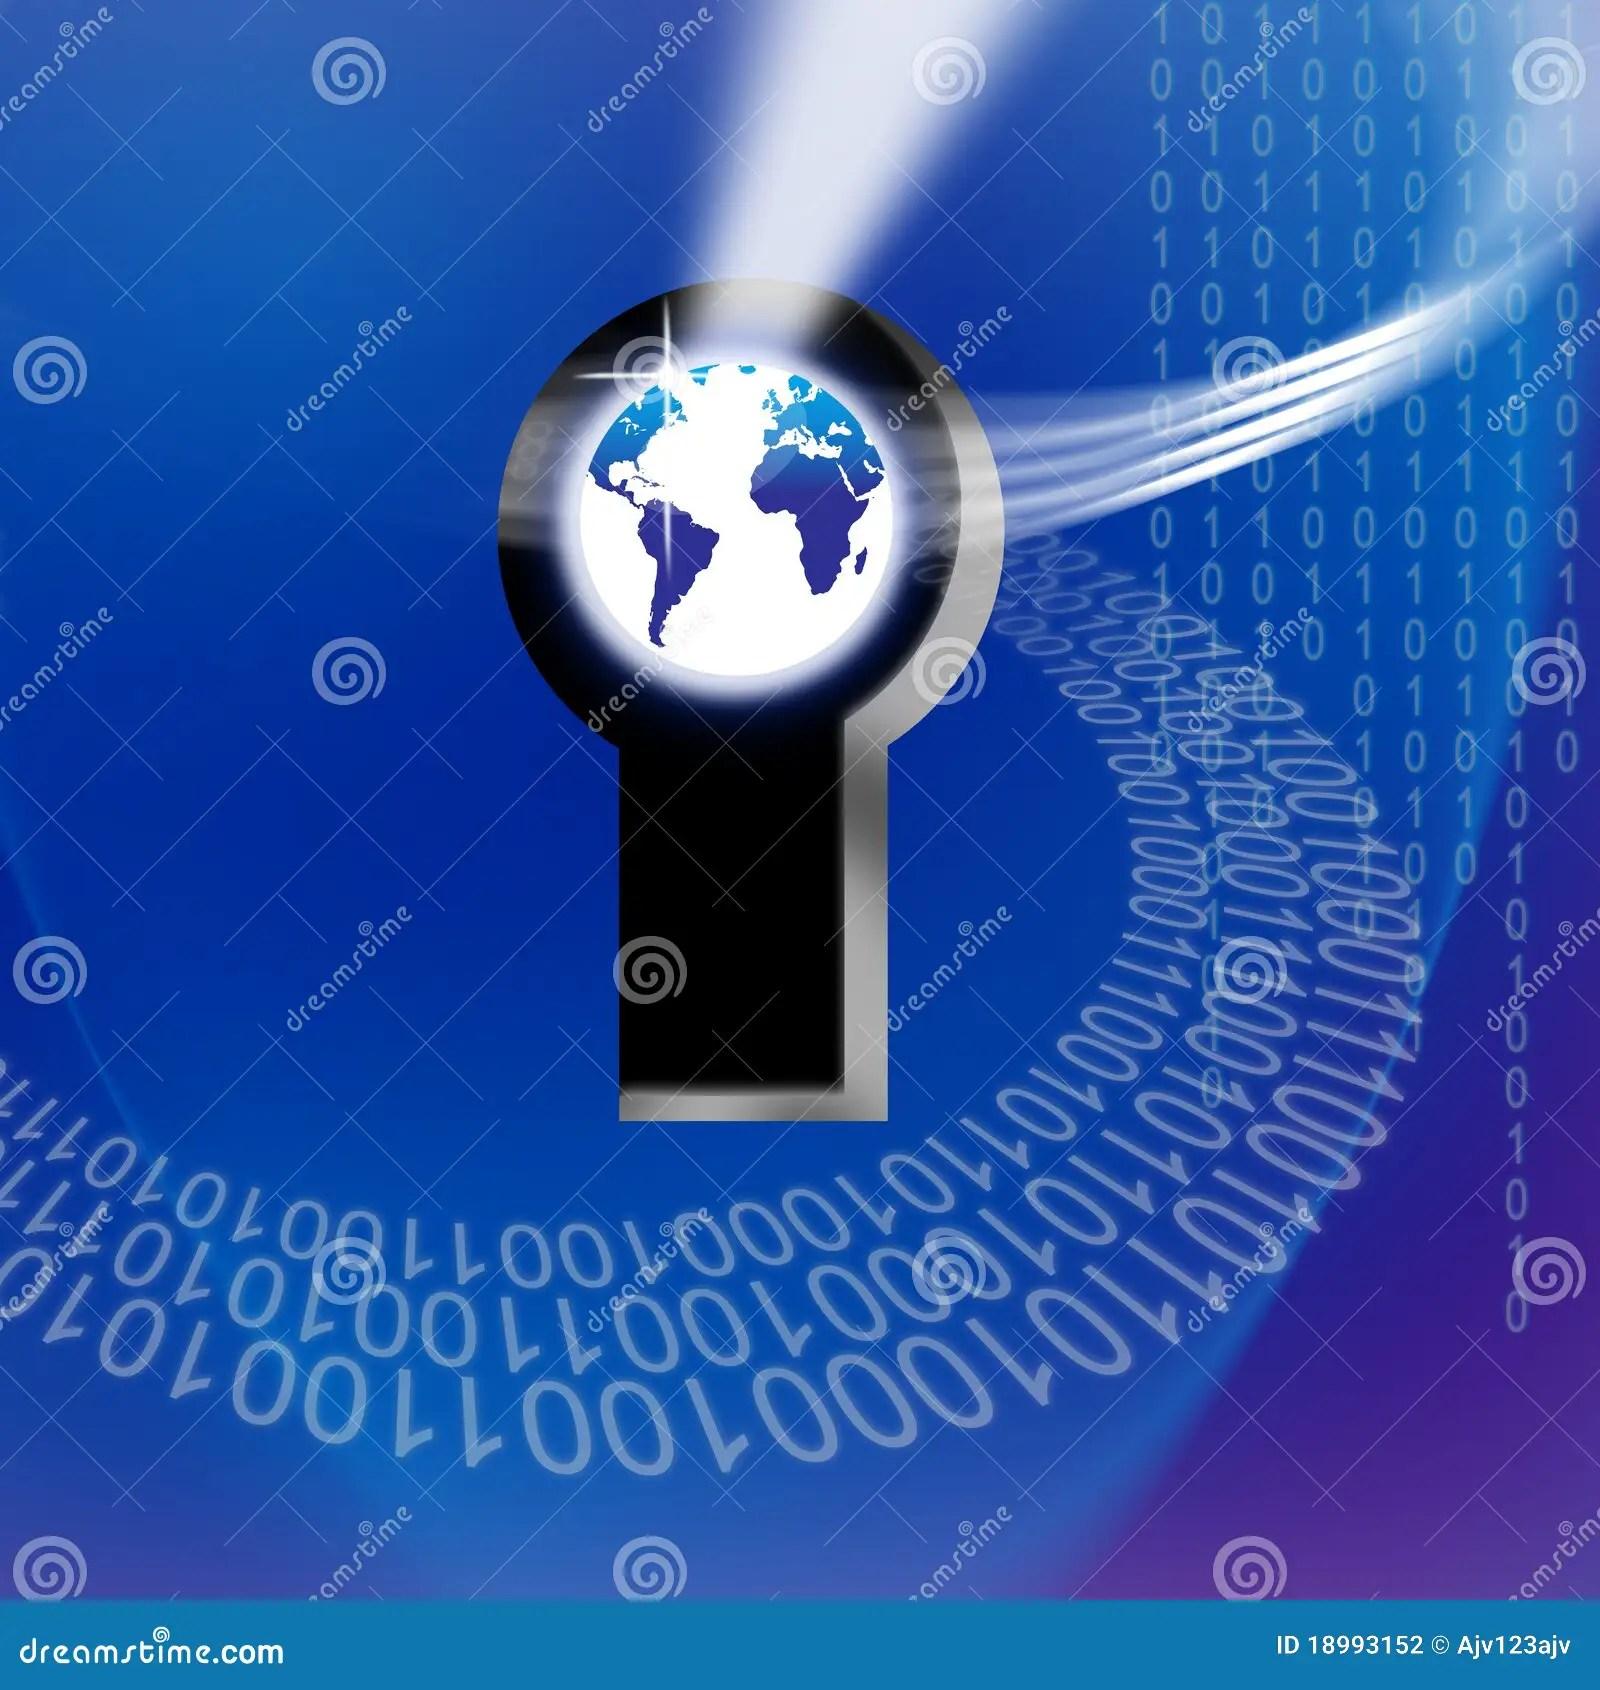 Secure Global Information Technology Key Stock Illustration Image 18993152